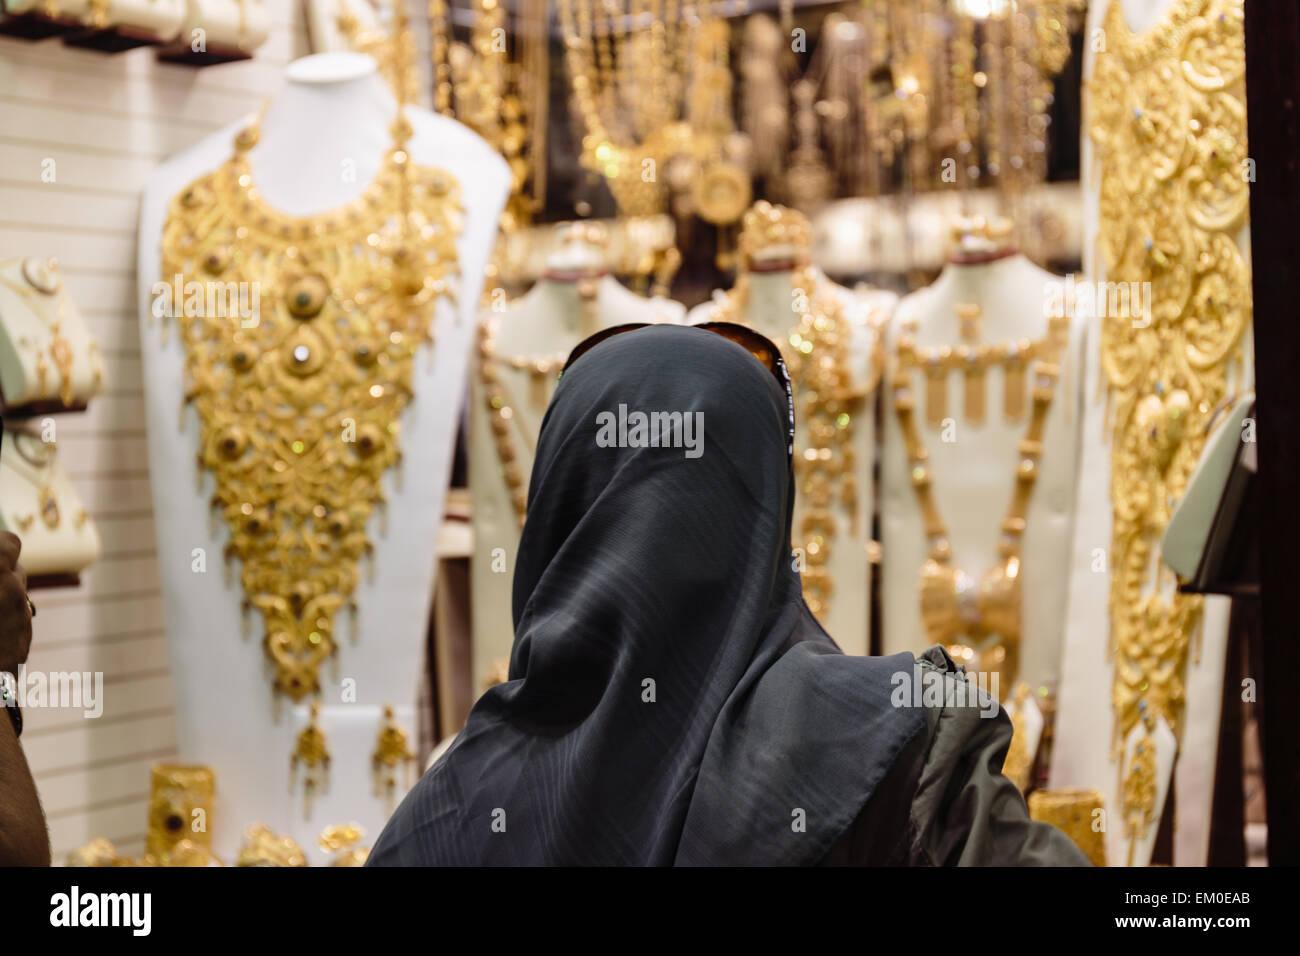 DUBAI, UAE - NOVEMBER 9: Gold market in Dubai on November 9, 2013, Dubai, UAE. The biggest market in Dubai - Stock Image